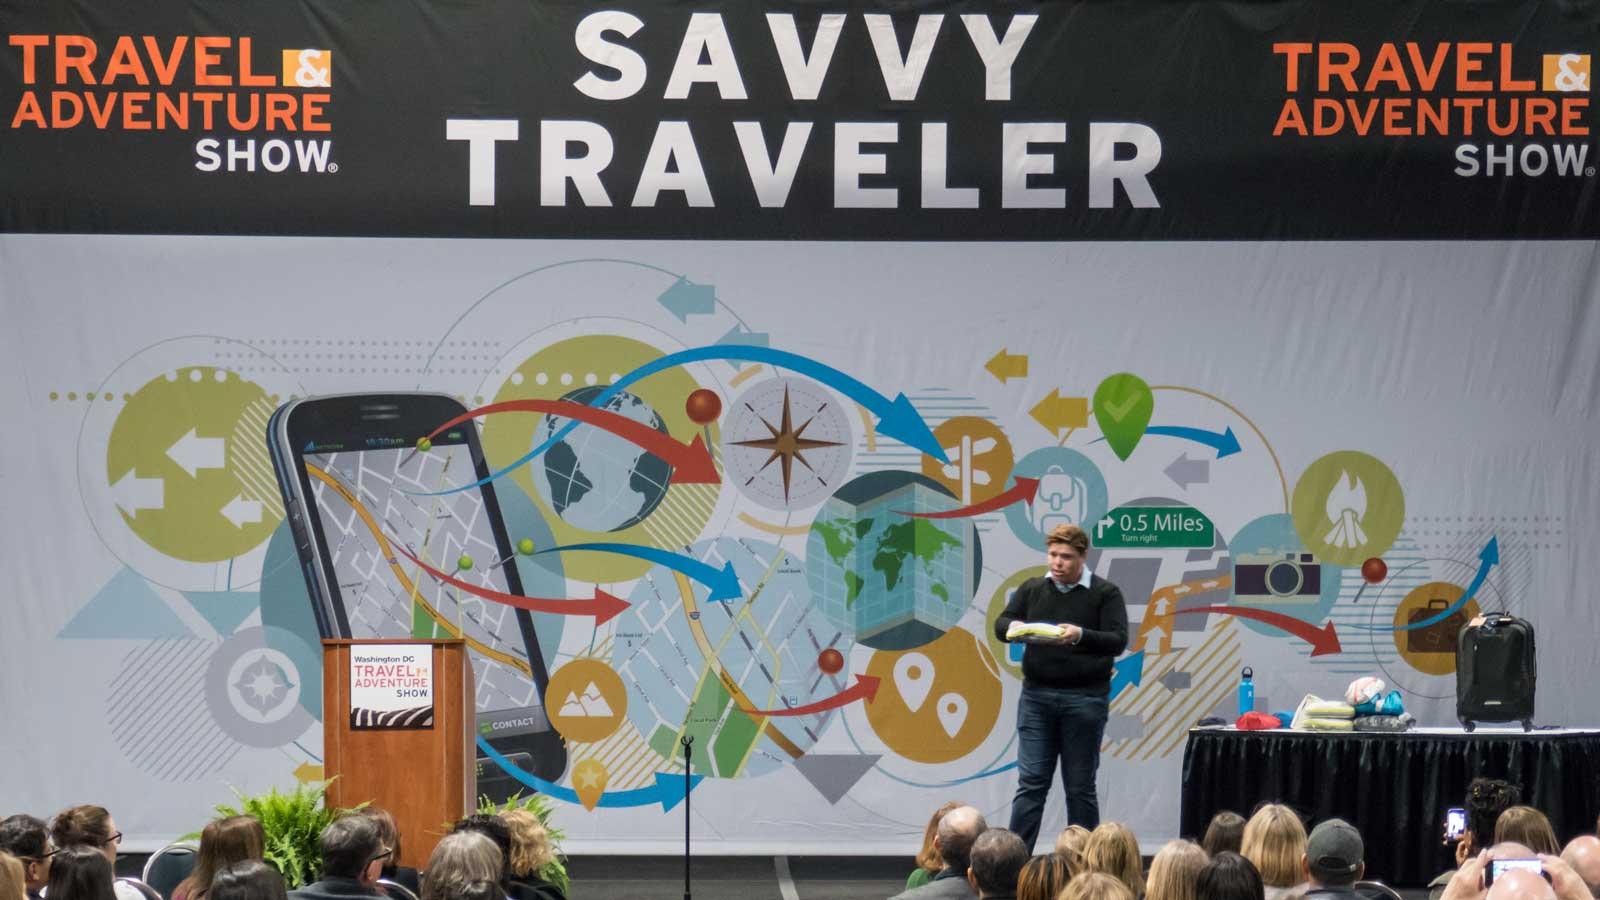 Angel Castellanos Savvy Traveler Theater DC Travel and Adventure Show